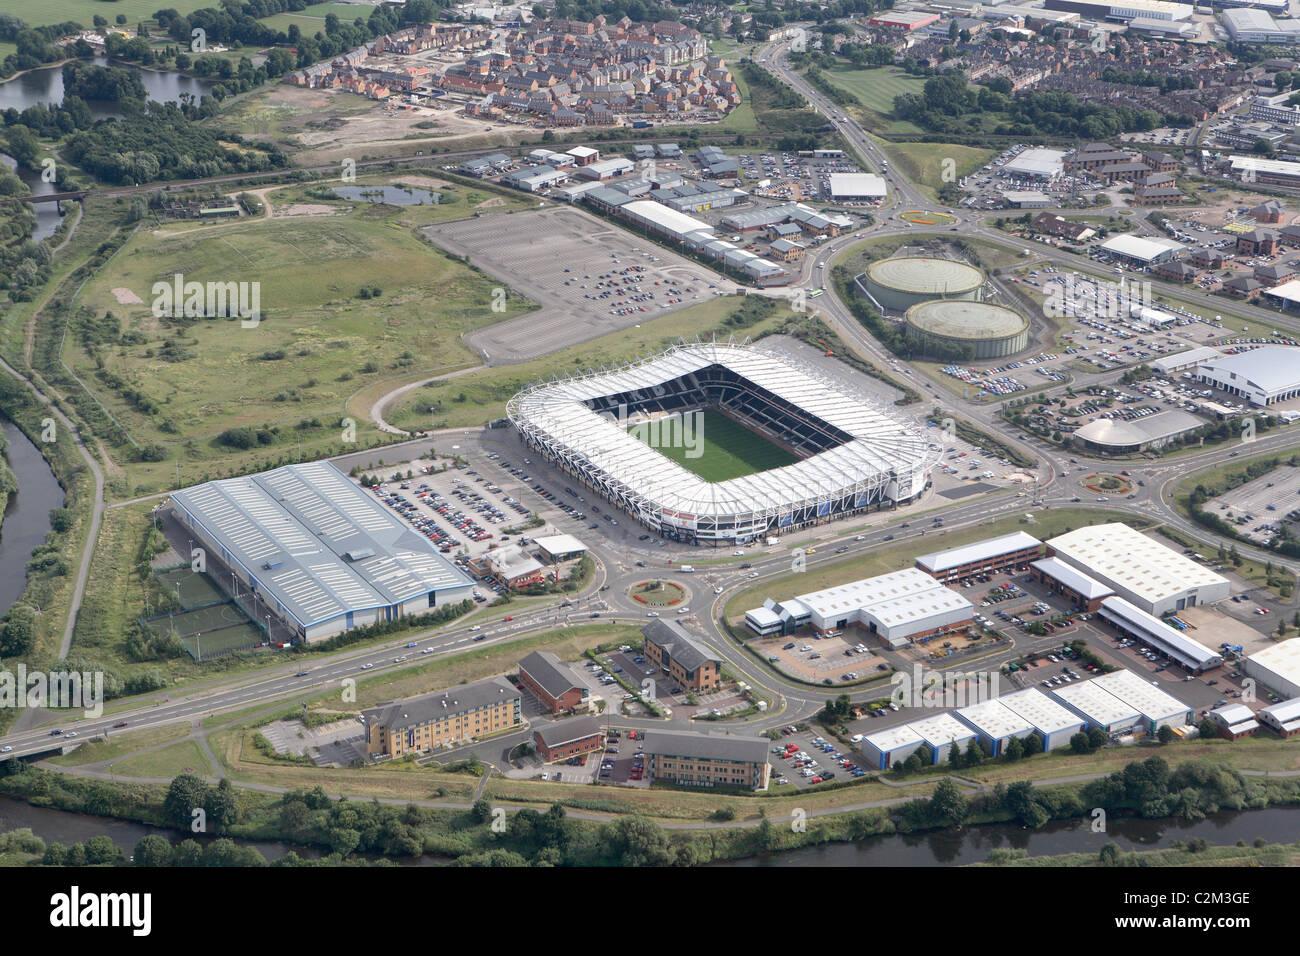 Pride park football ground aerial view Stock Photo - Alamy